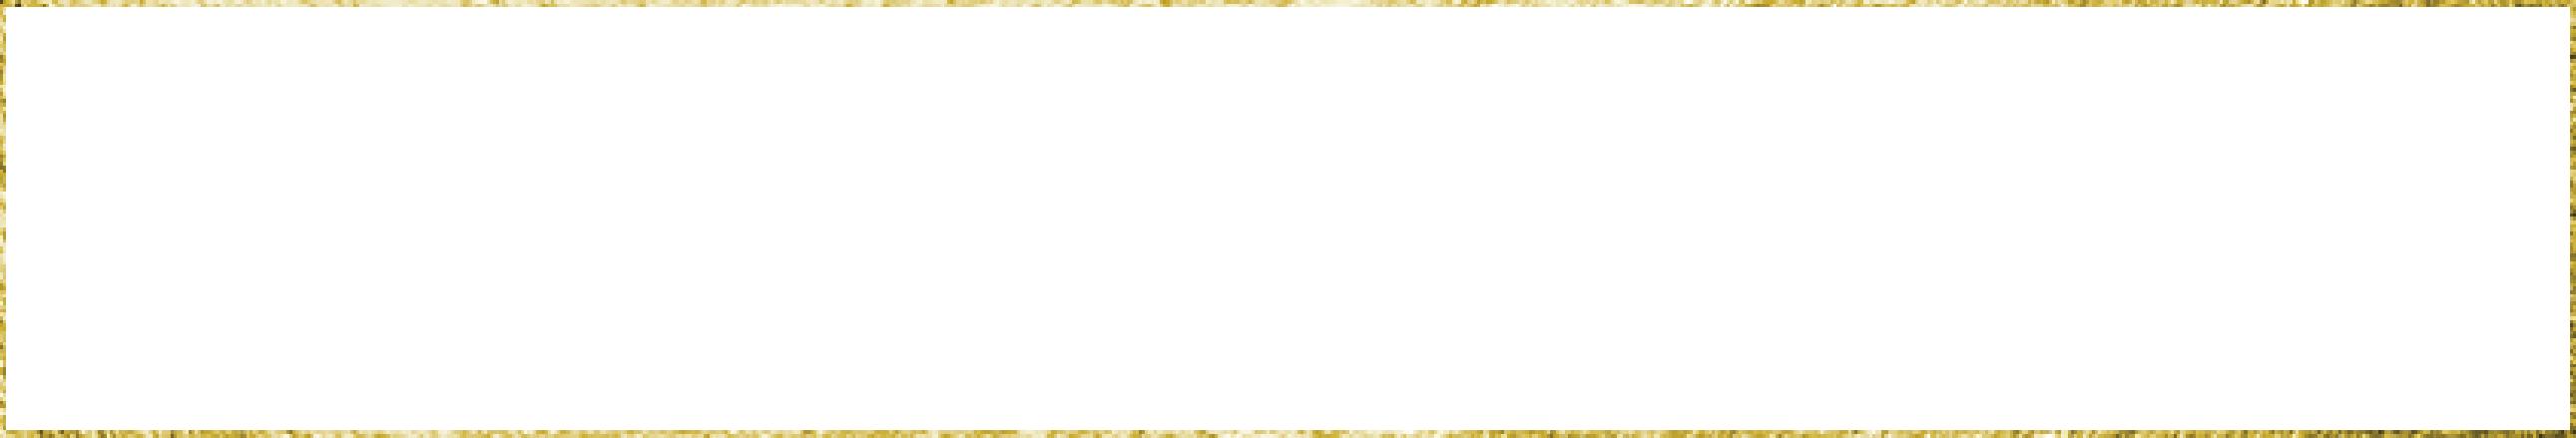 JESUS-IS-MY-PROMISE-LAND